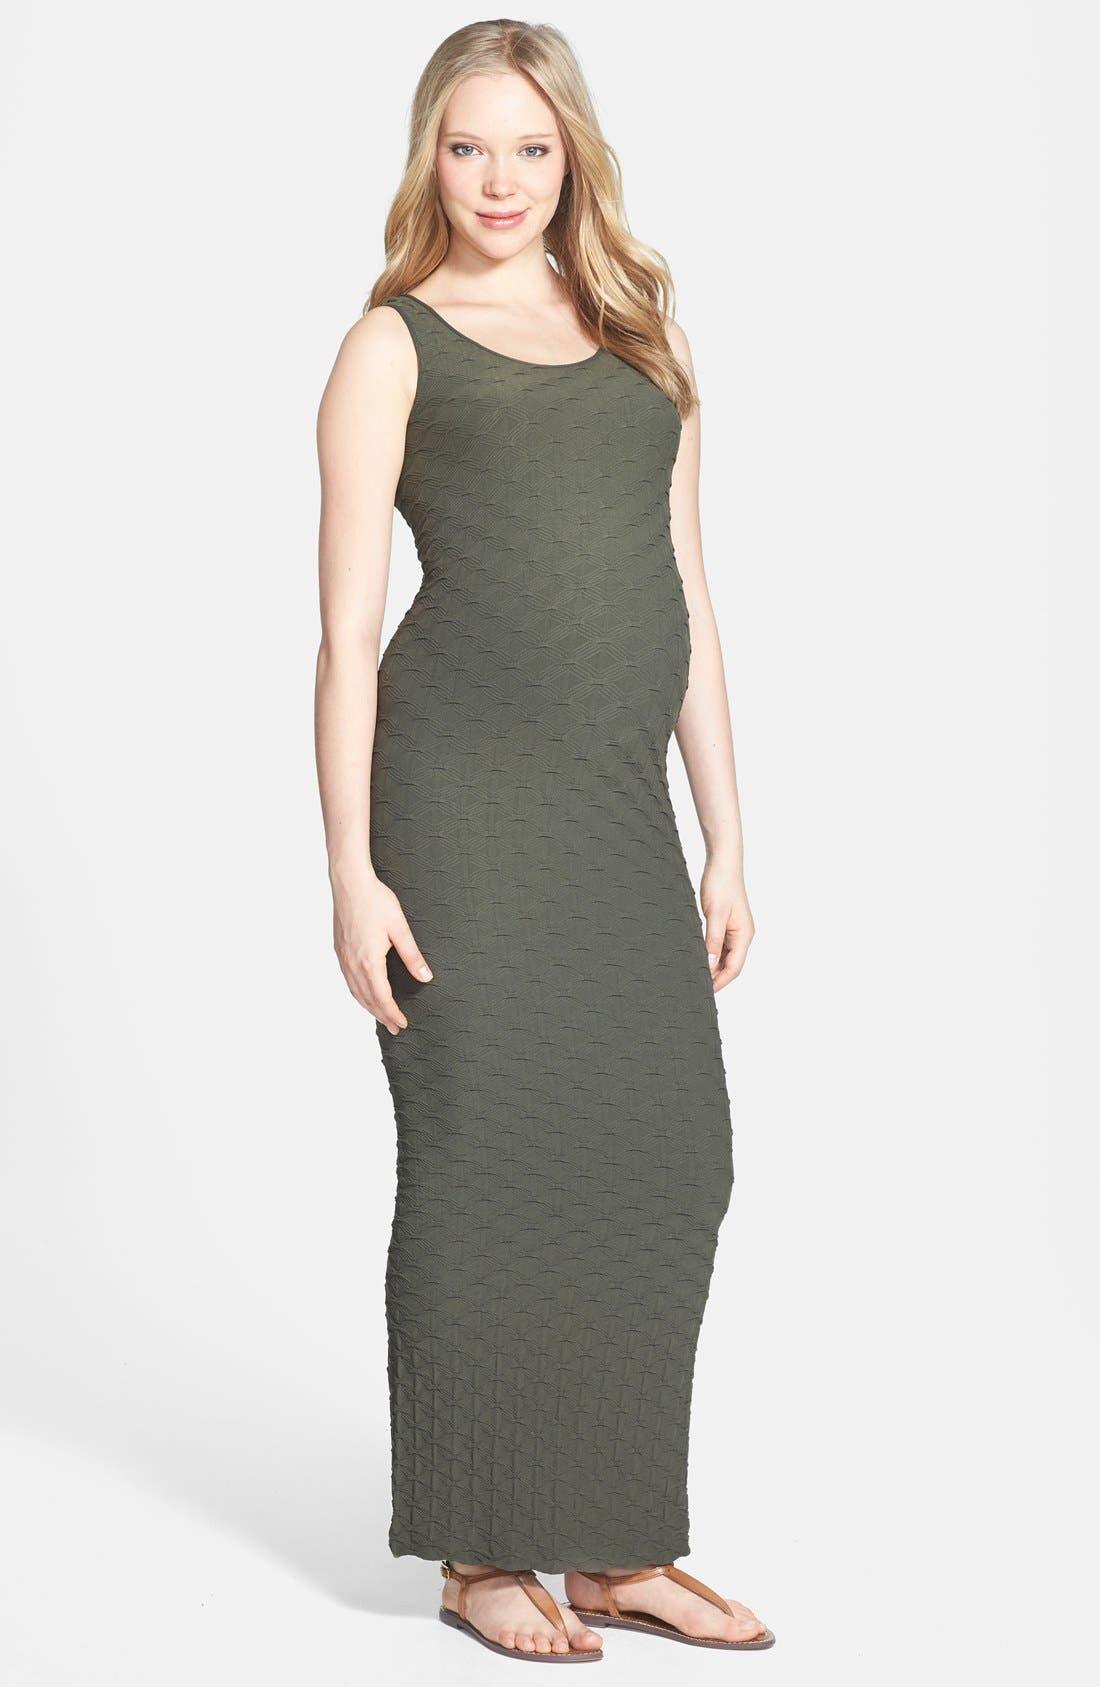 'Lattice' Maxi Maternity Dress,                         Main,                         color, Safari